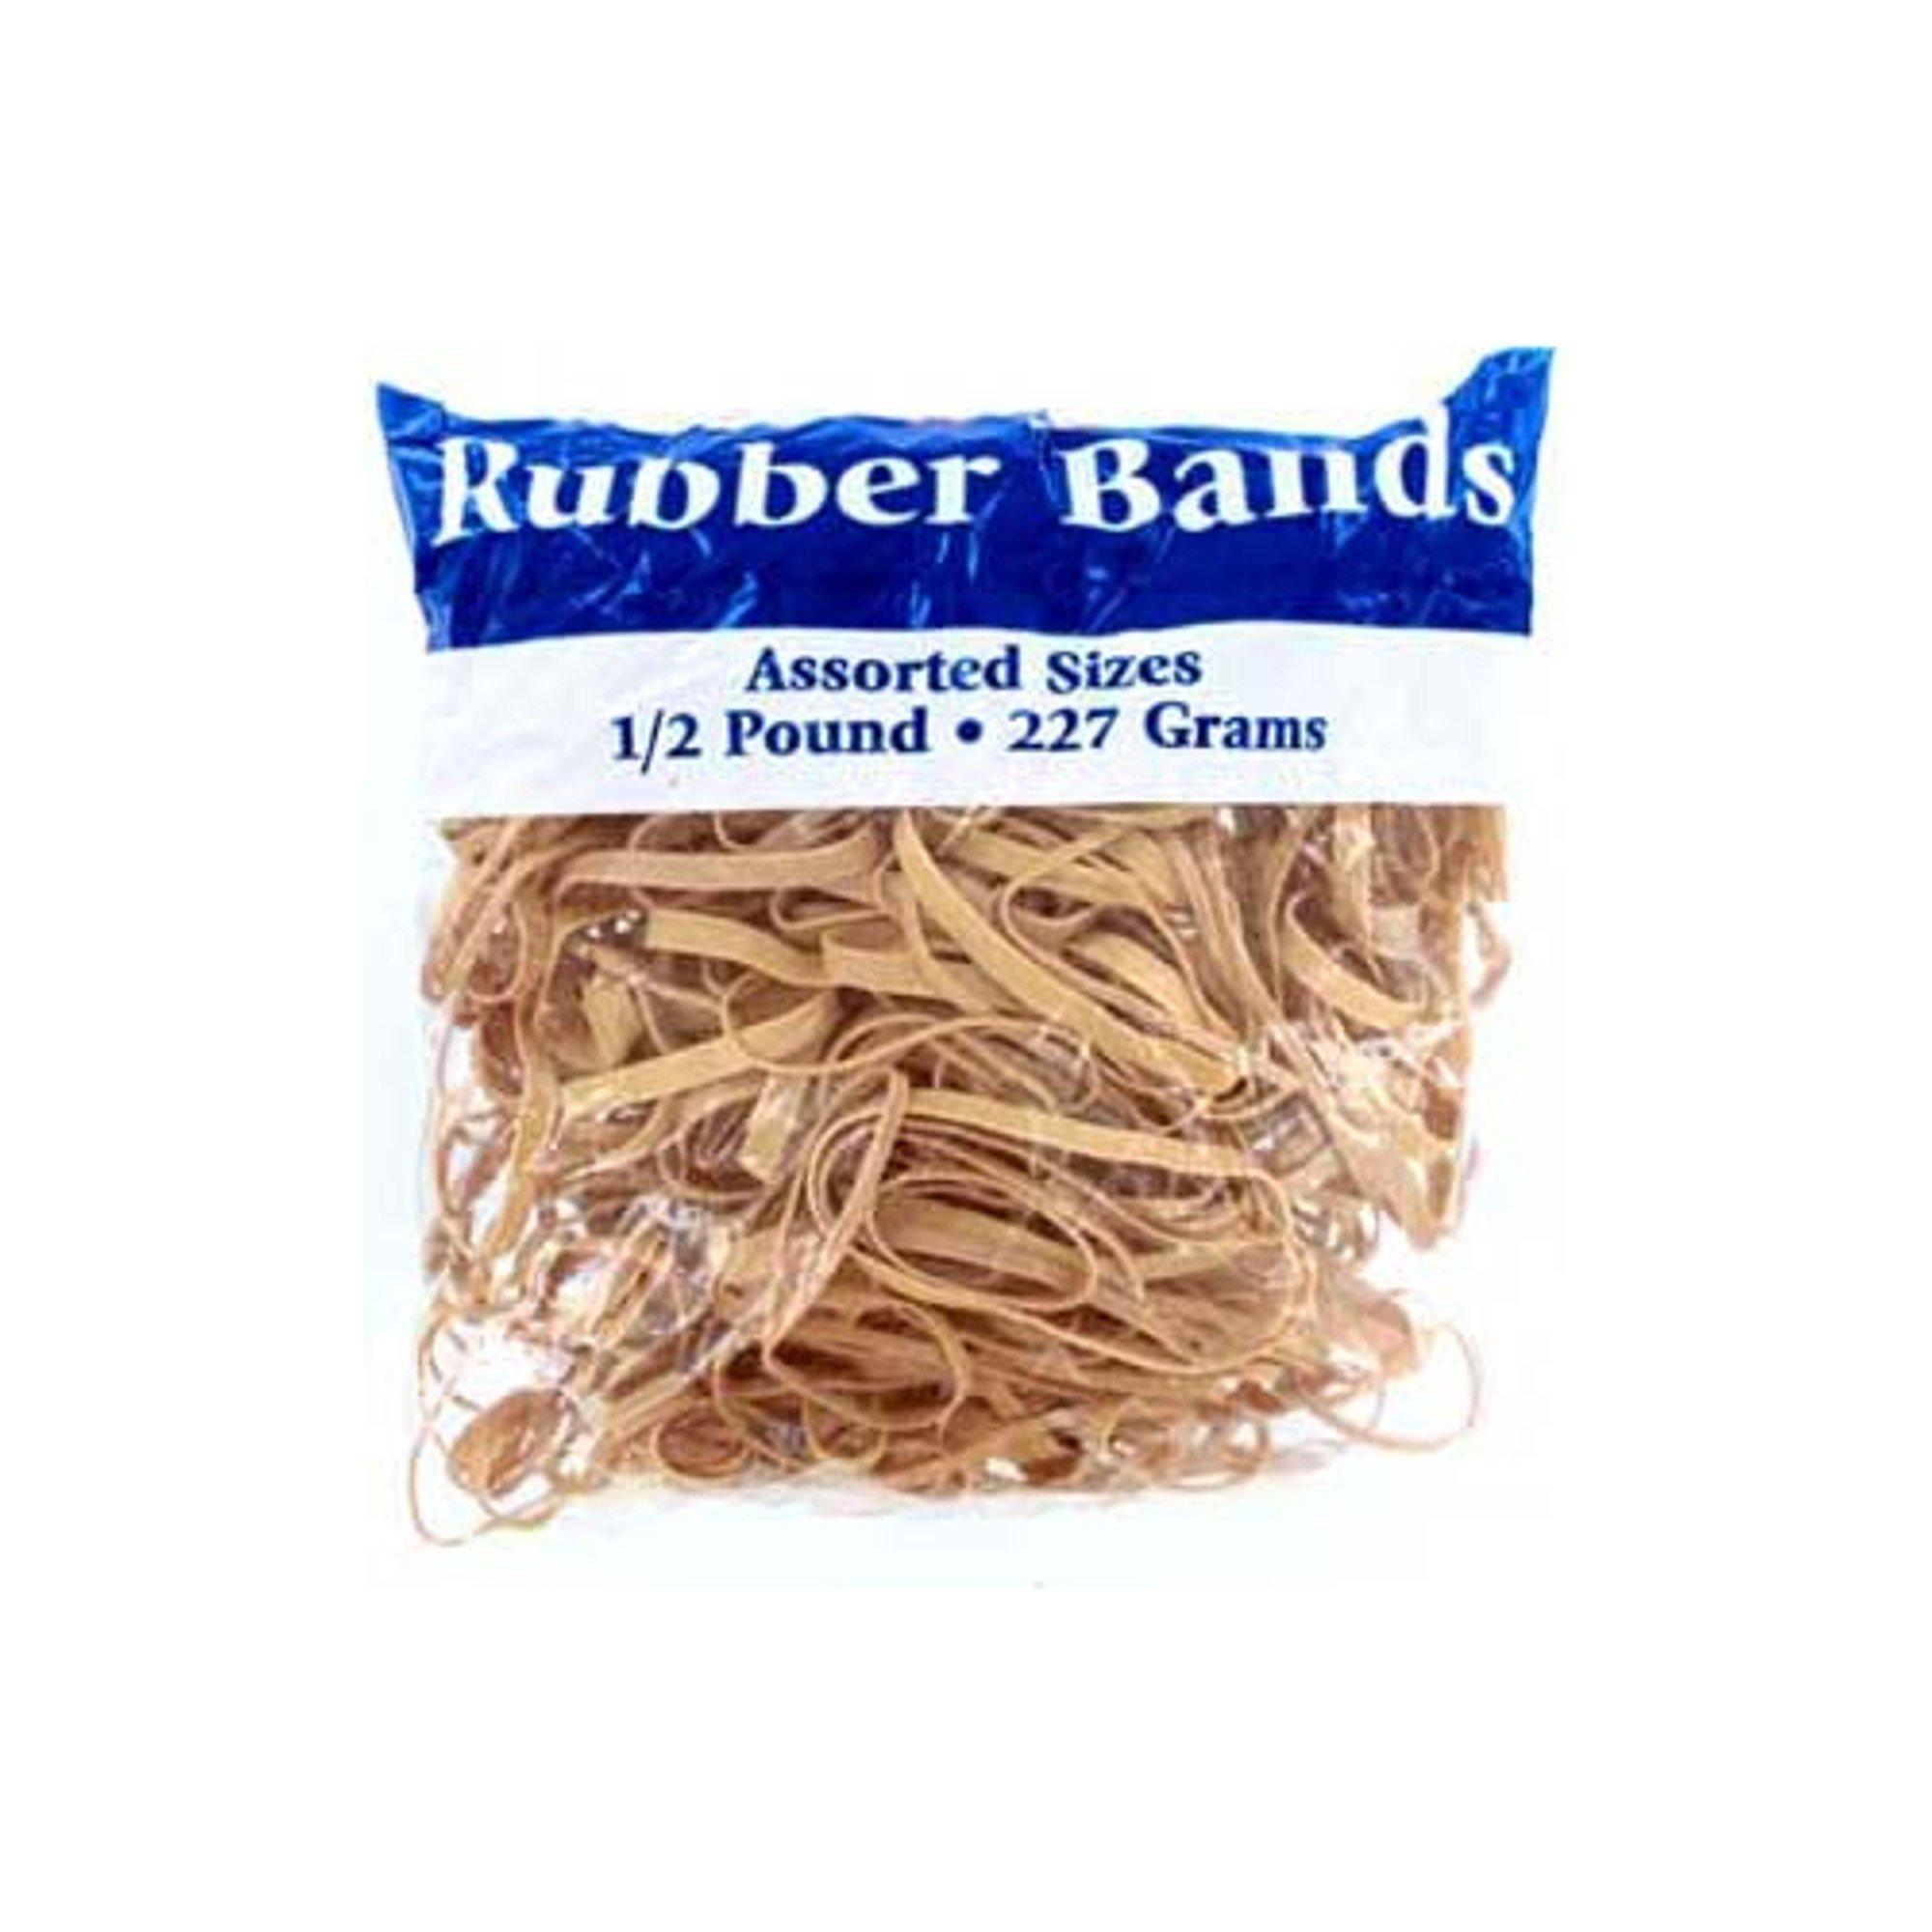 123-Wholesale - Set of 36 Rubber Bands Assortment - School & Office Supplies Rubber Bands